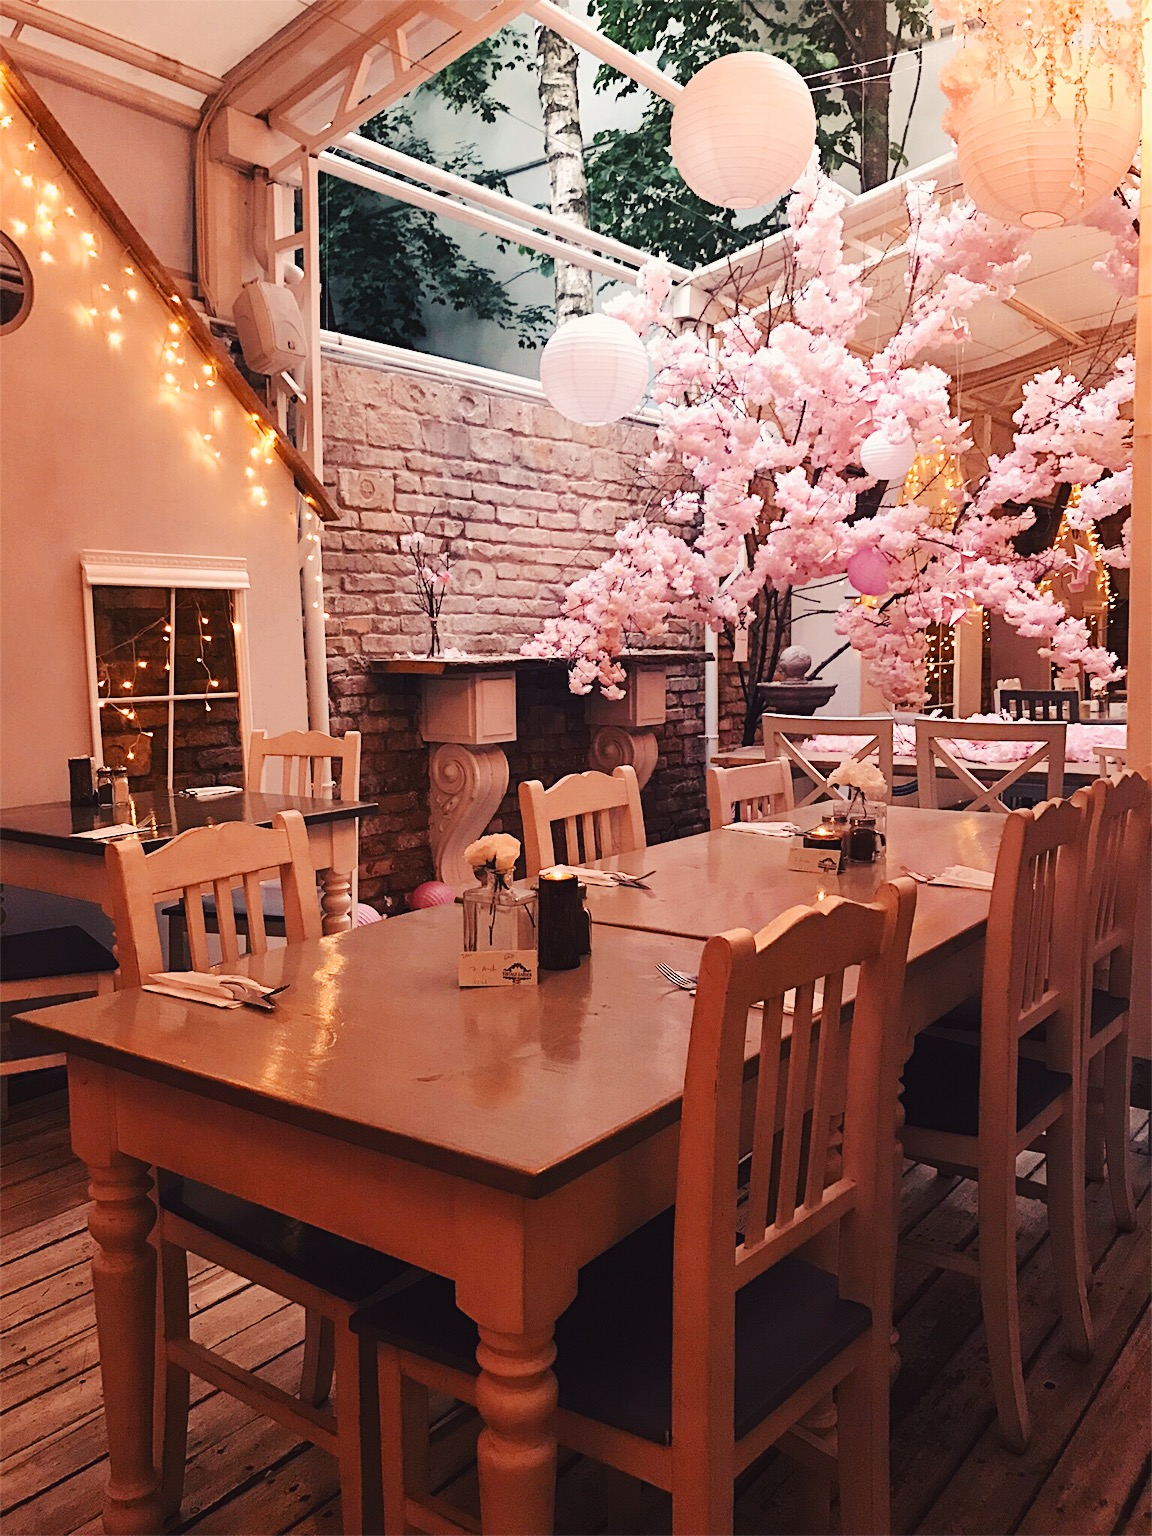 Vintage Garden interior - it was a fairytale!